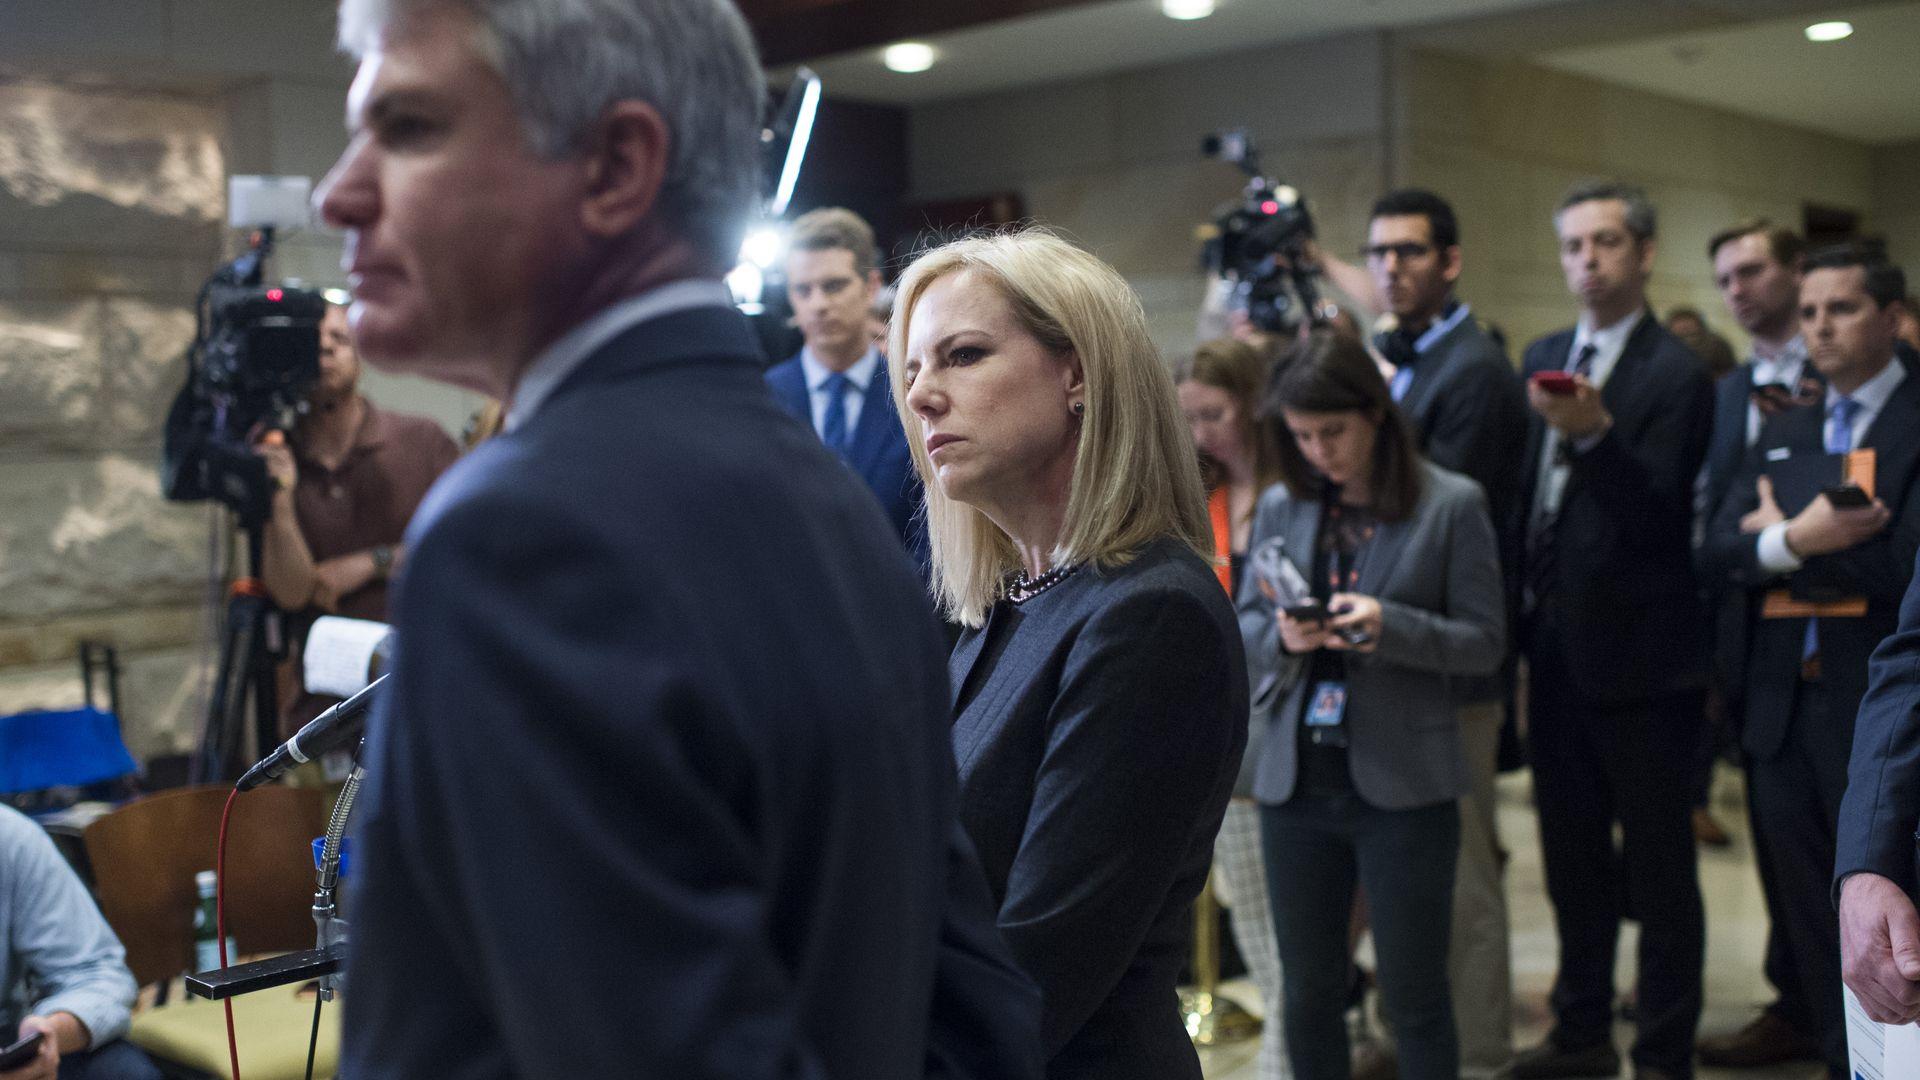 DHS Secretary Nielsen